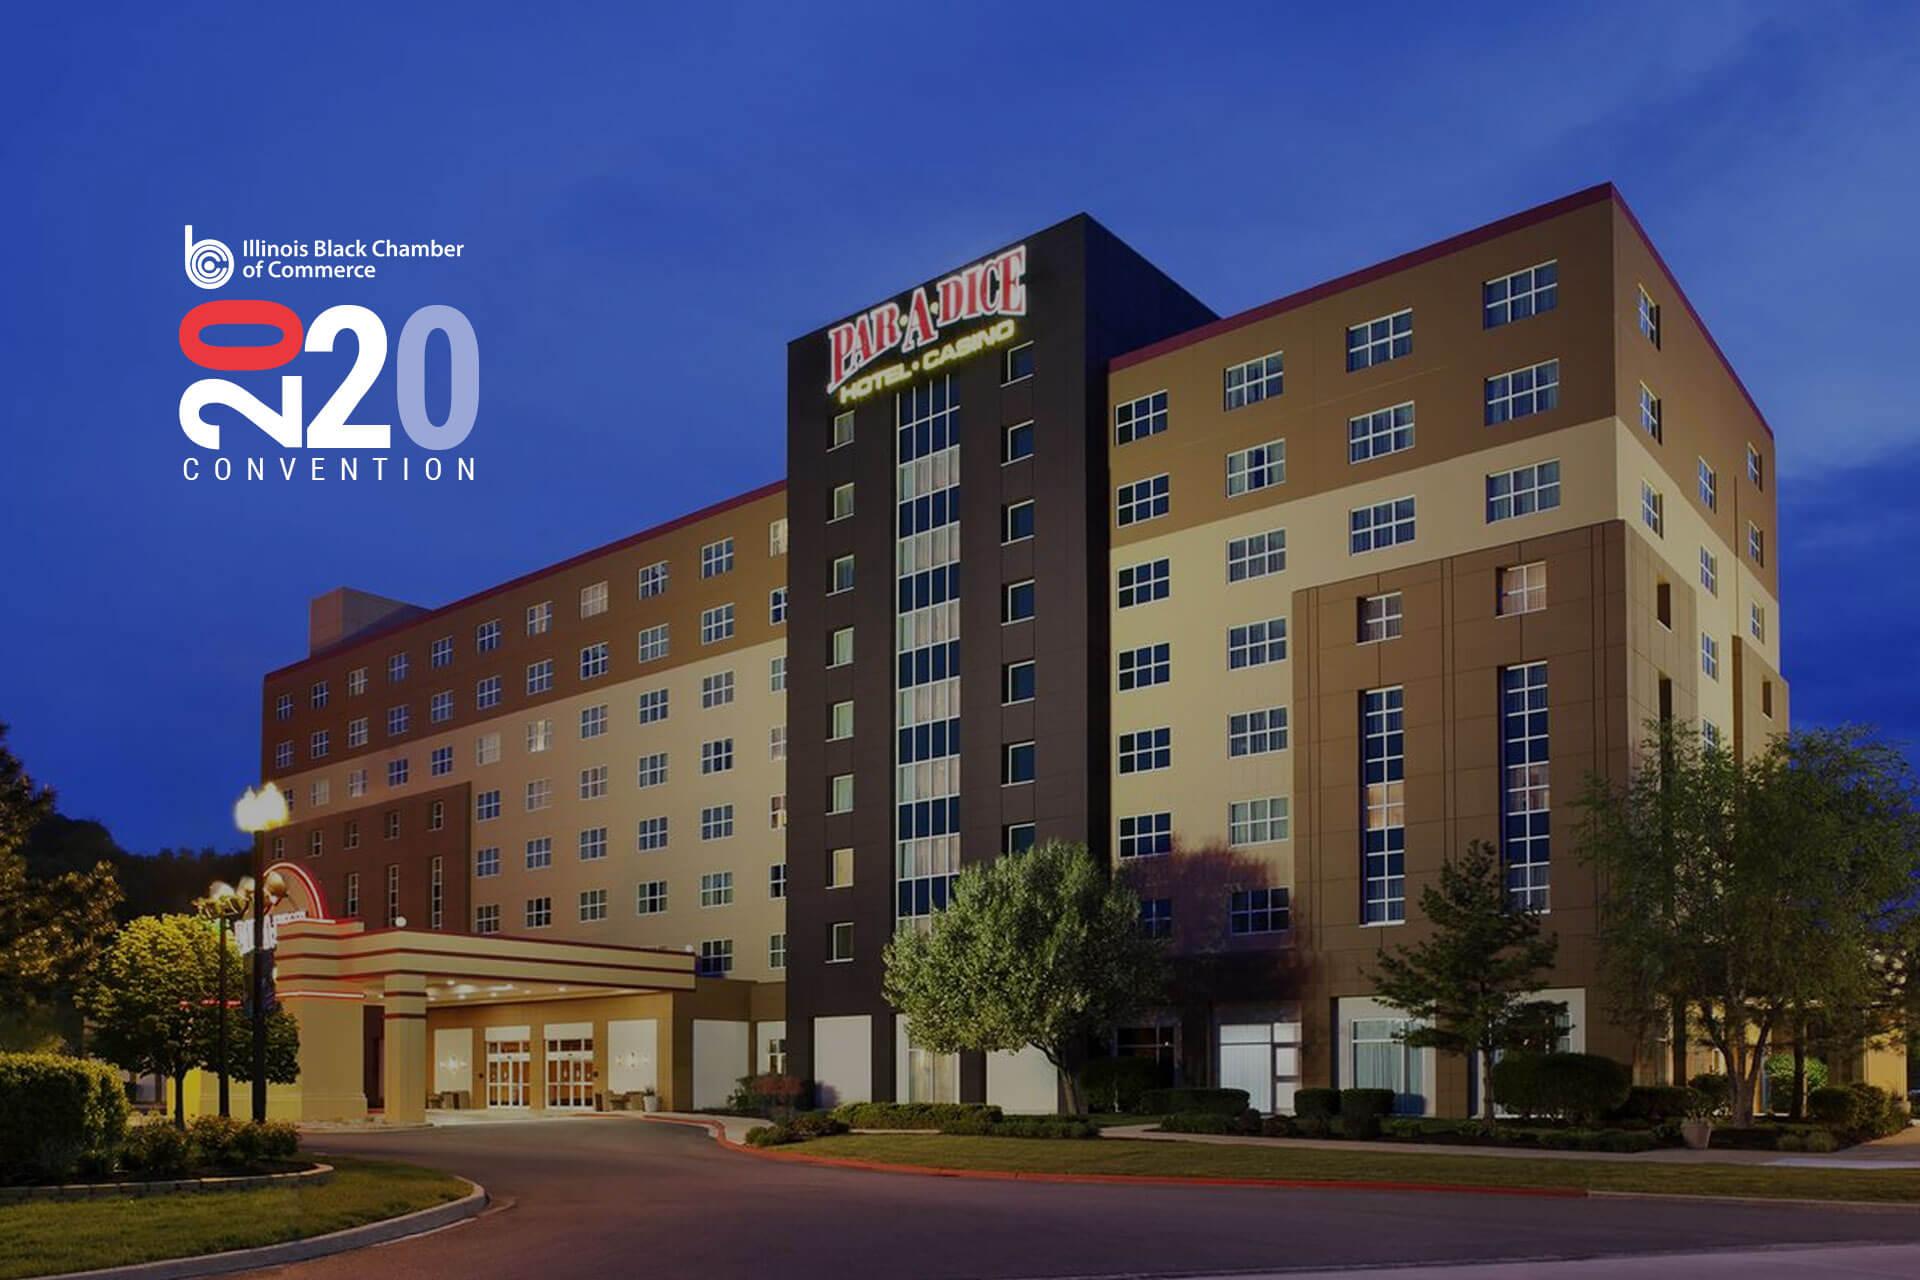 Paradice Hotel & Casino